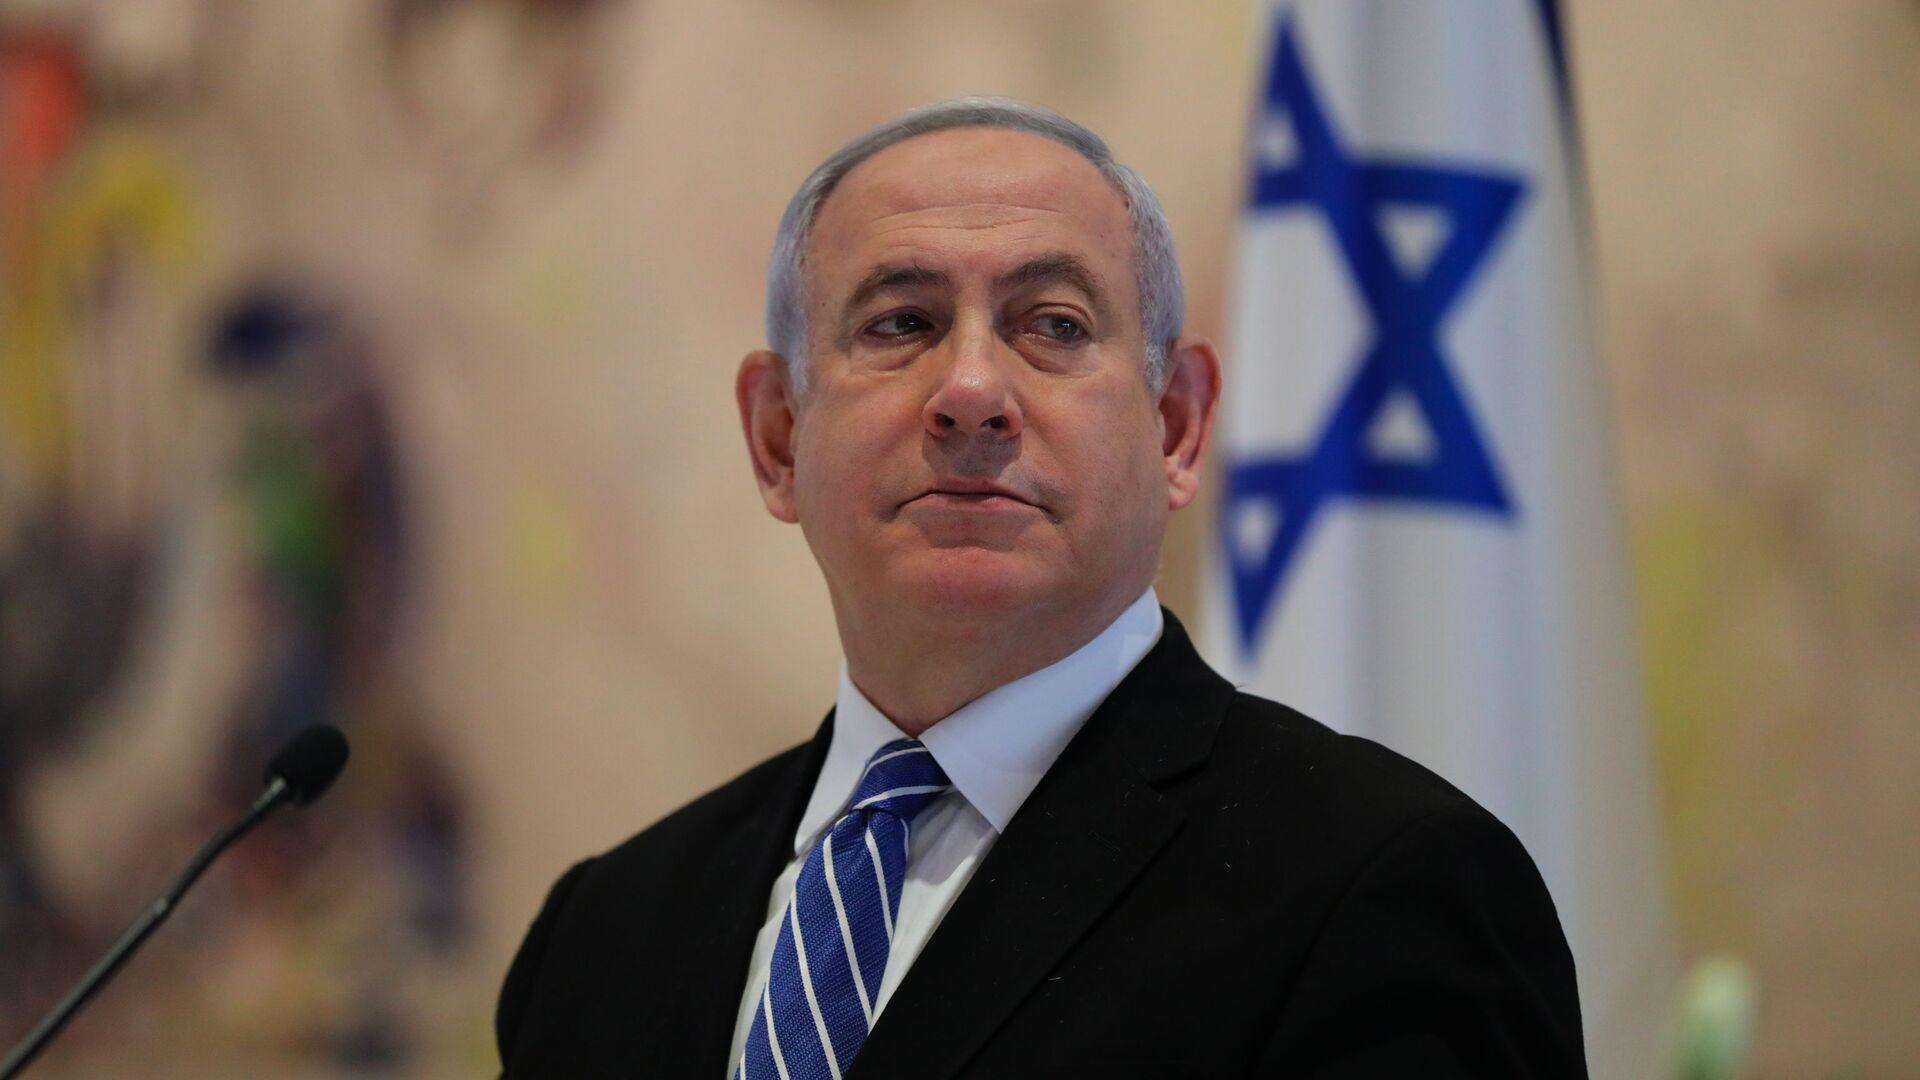 Il primo ministro dell'Israele Benjamin Netanyahu  - Sputnik Italia, 1920, 20.05.2021